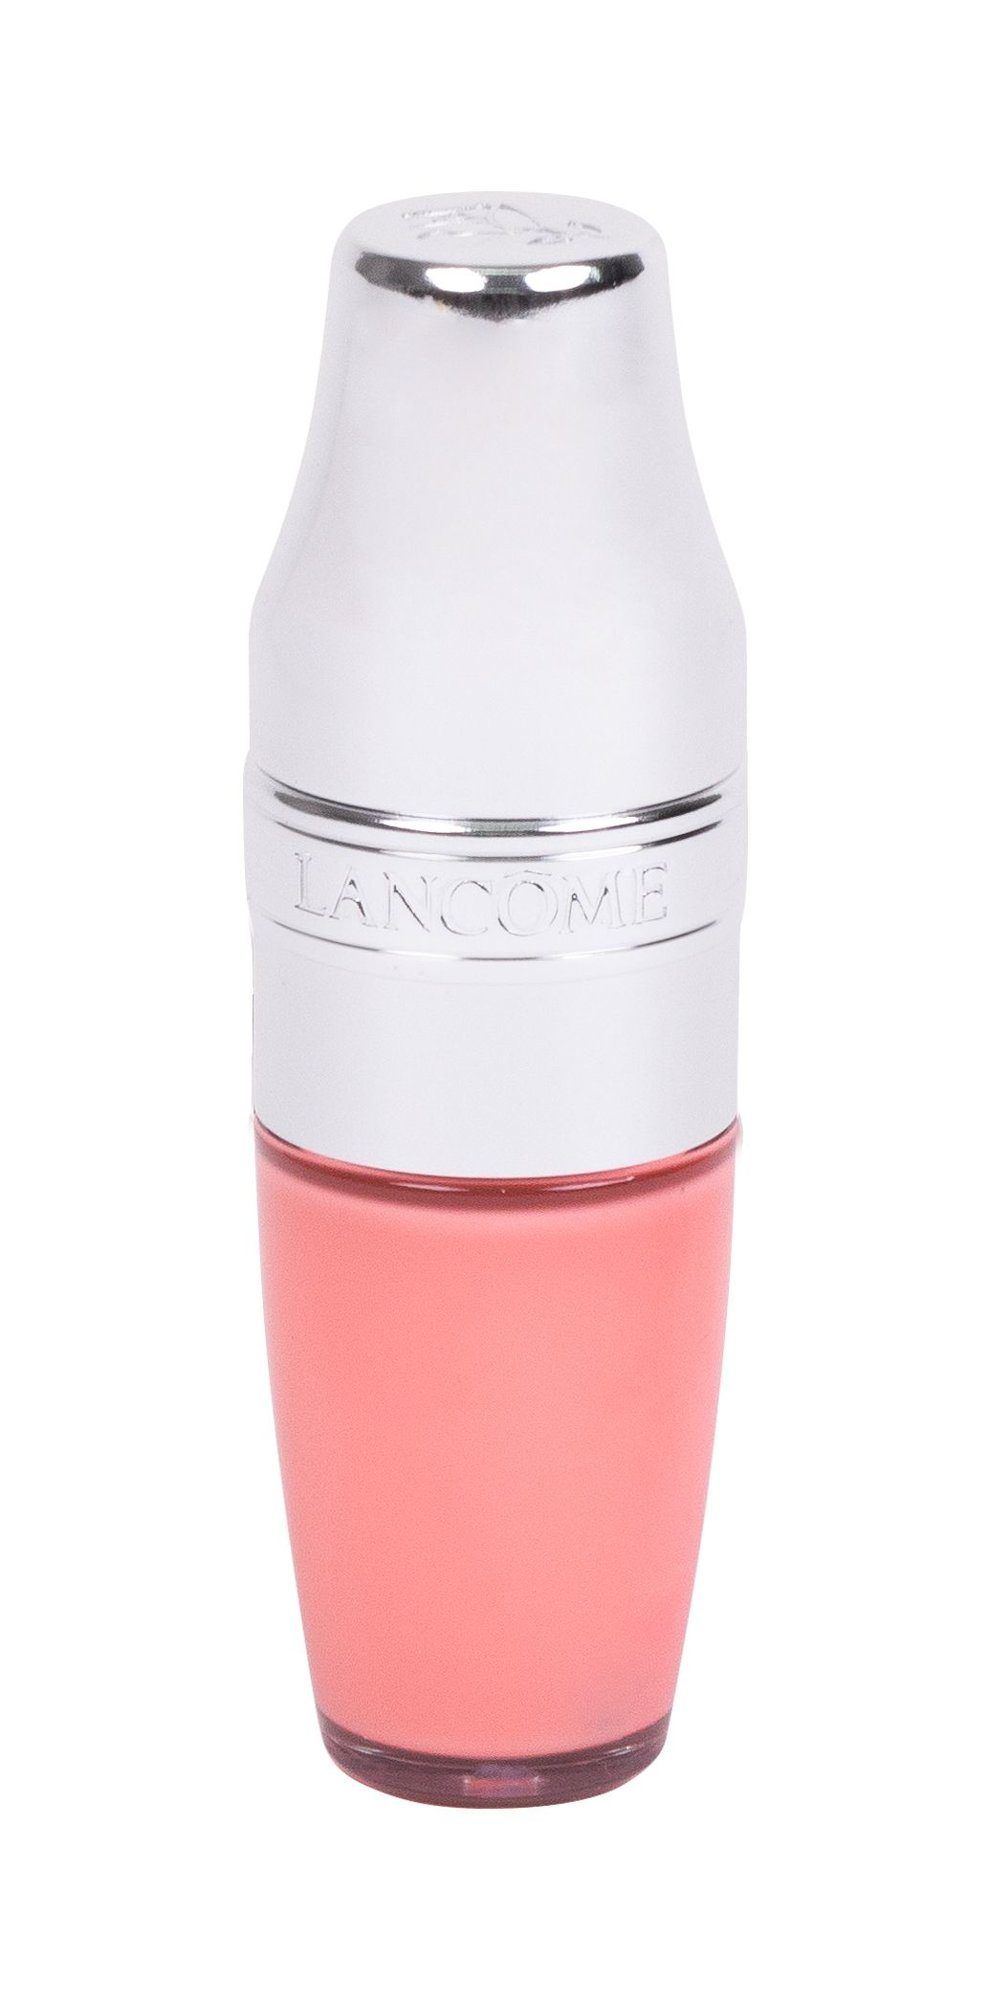 Lancôme Juicy Shaker Lip Gloss 6,5ml 142 Freedom Of Peach